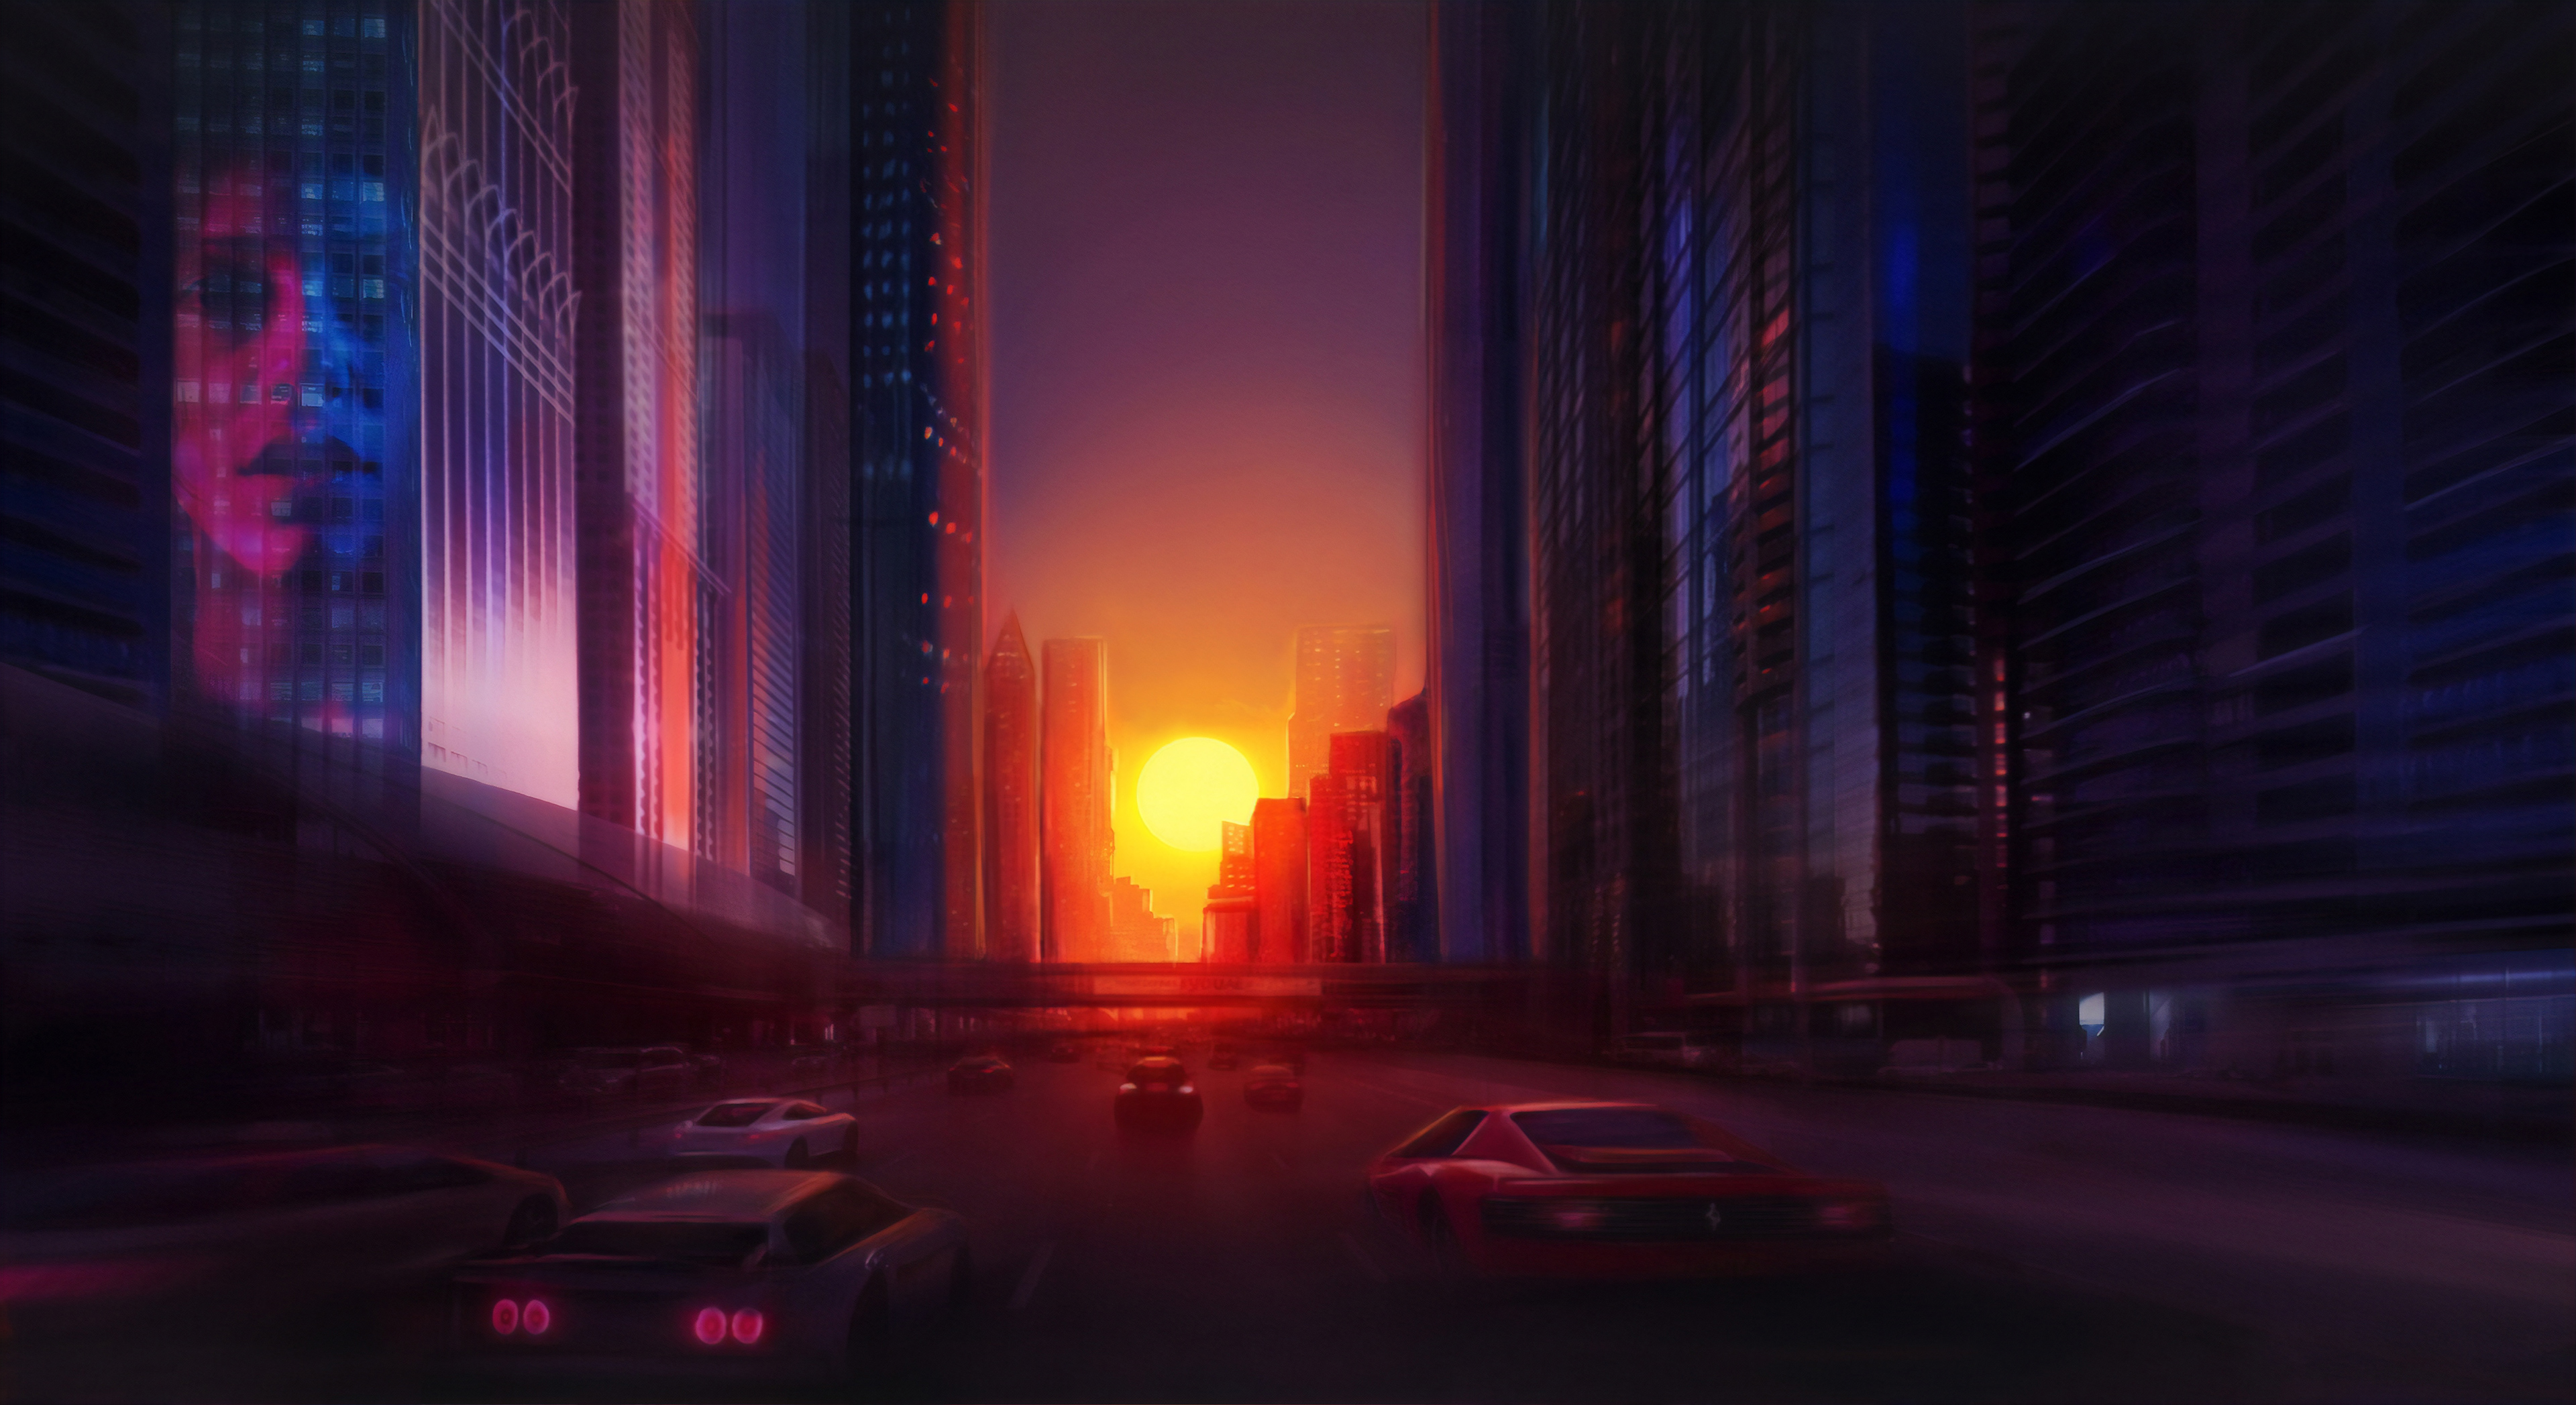 Building City Futuristic Sunset 3840x2095